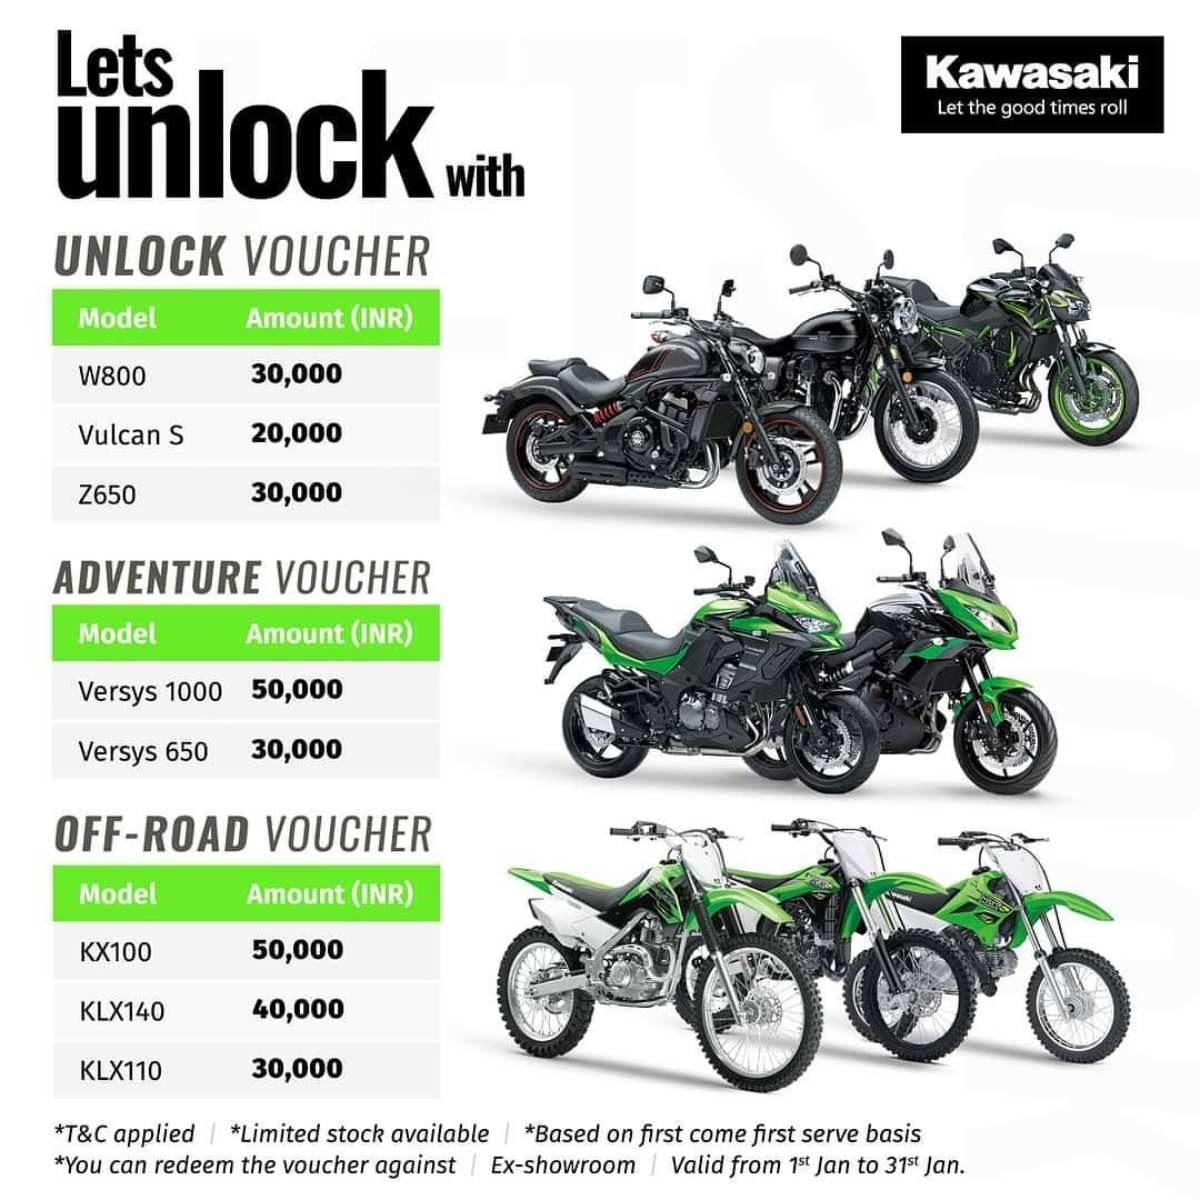 kawasaki january offers